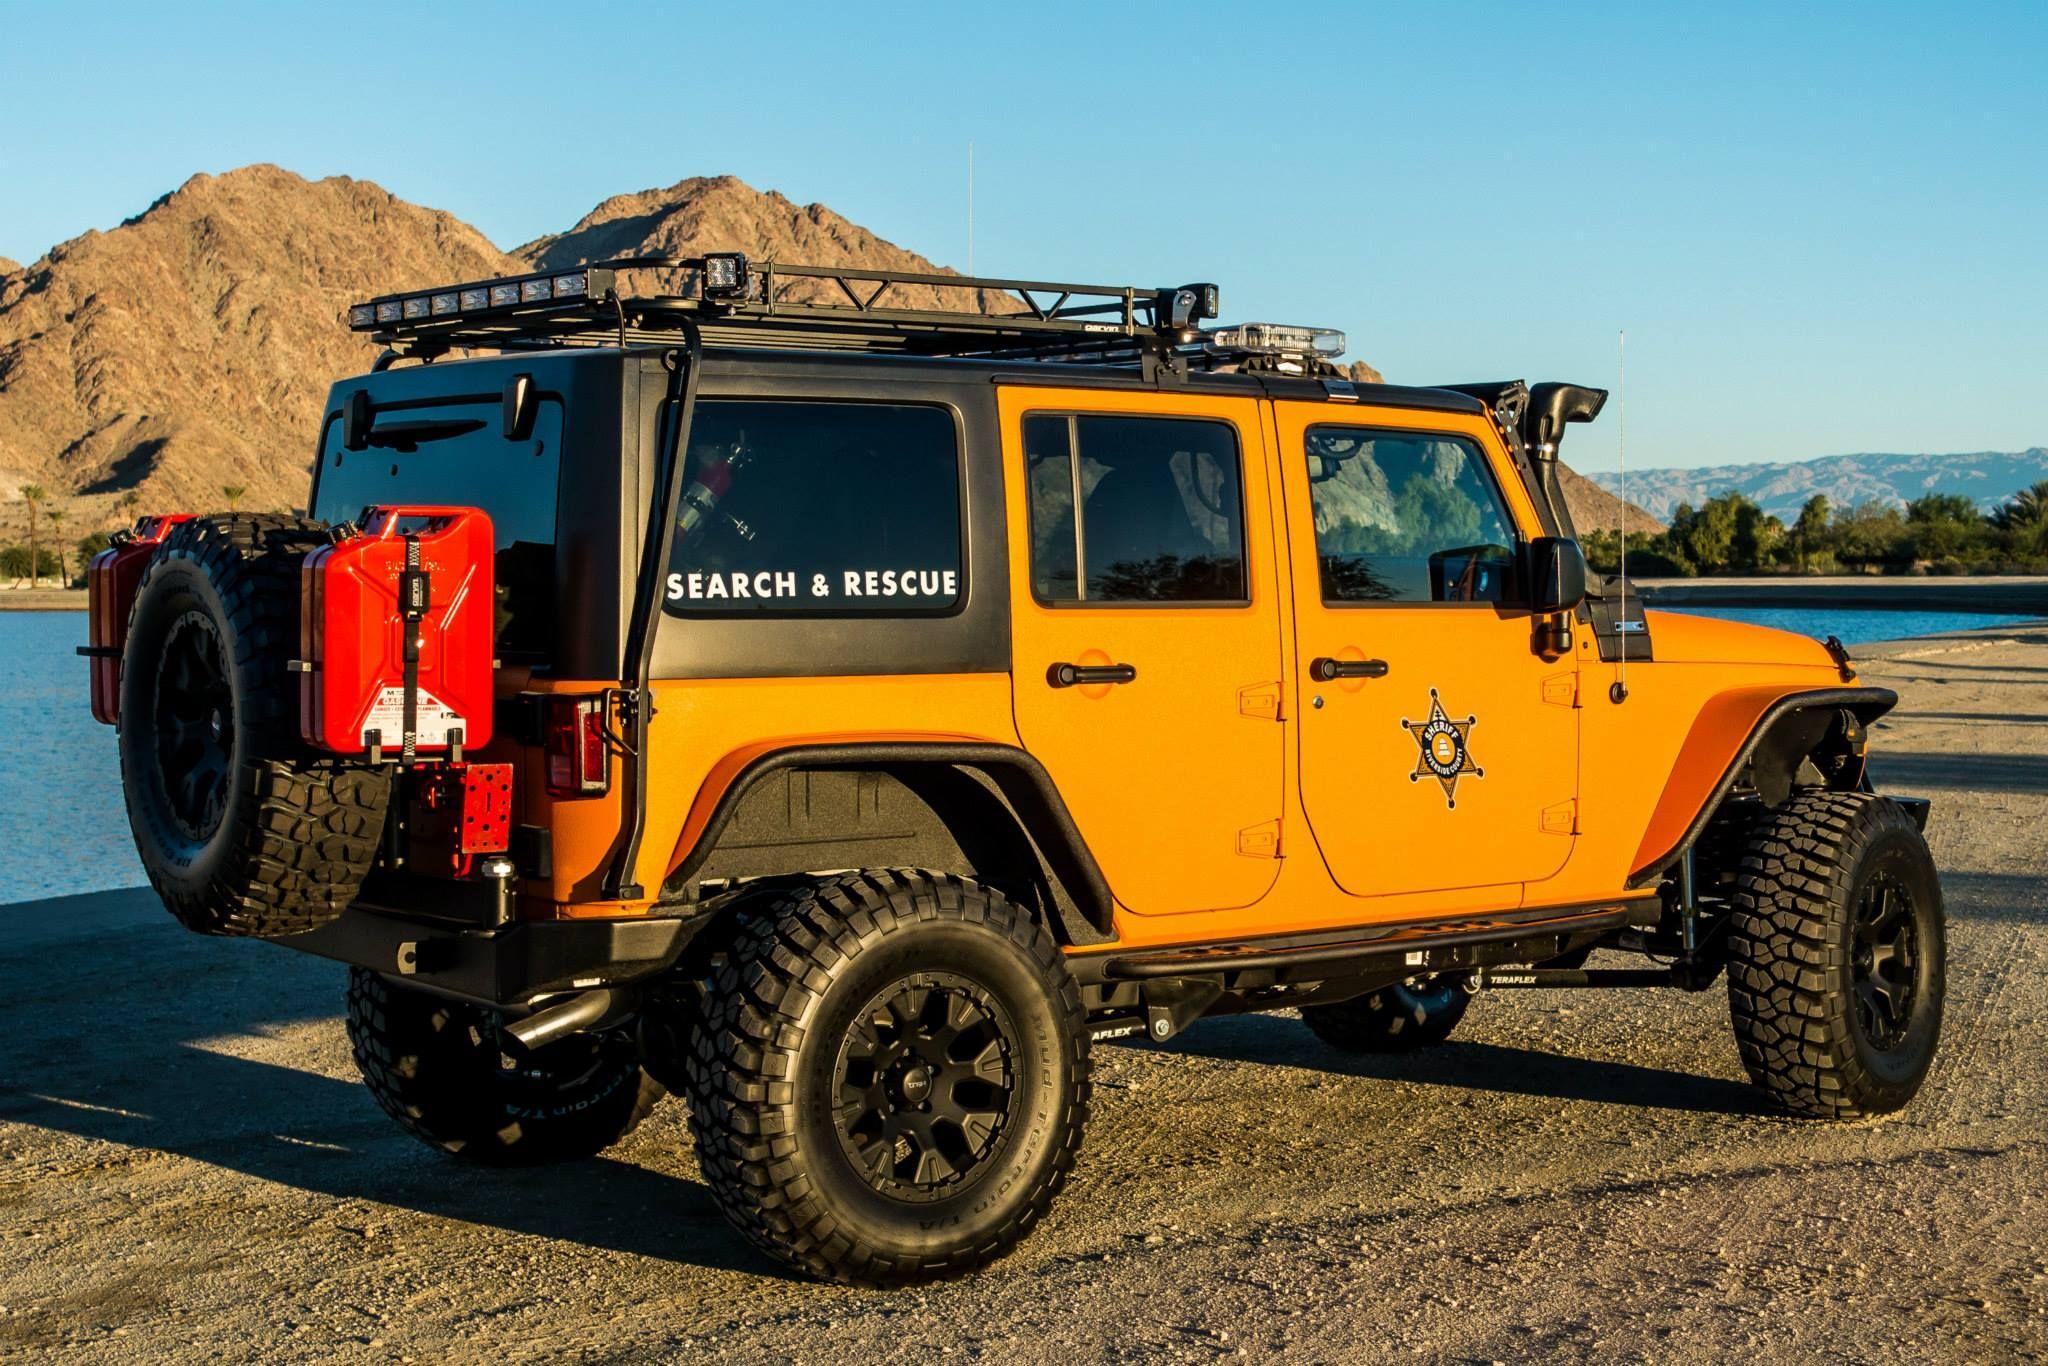 Search and Rescue JK Wrangler Jeep Jeep JK Wrangler